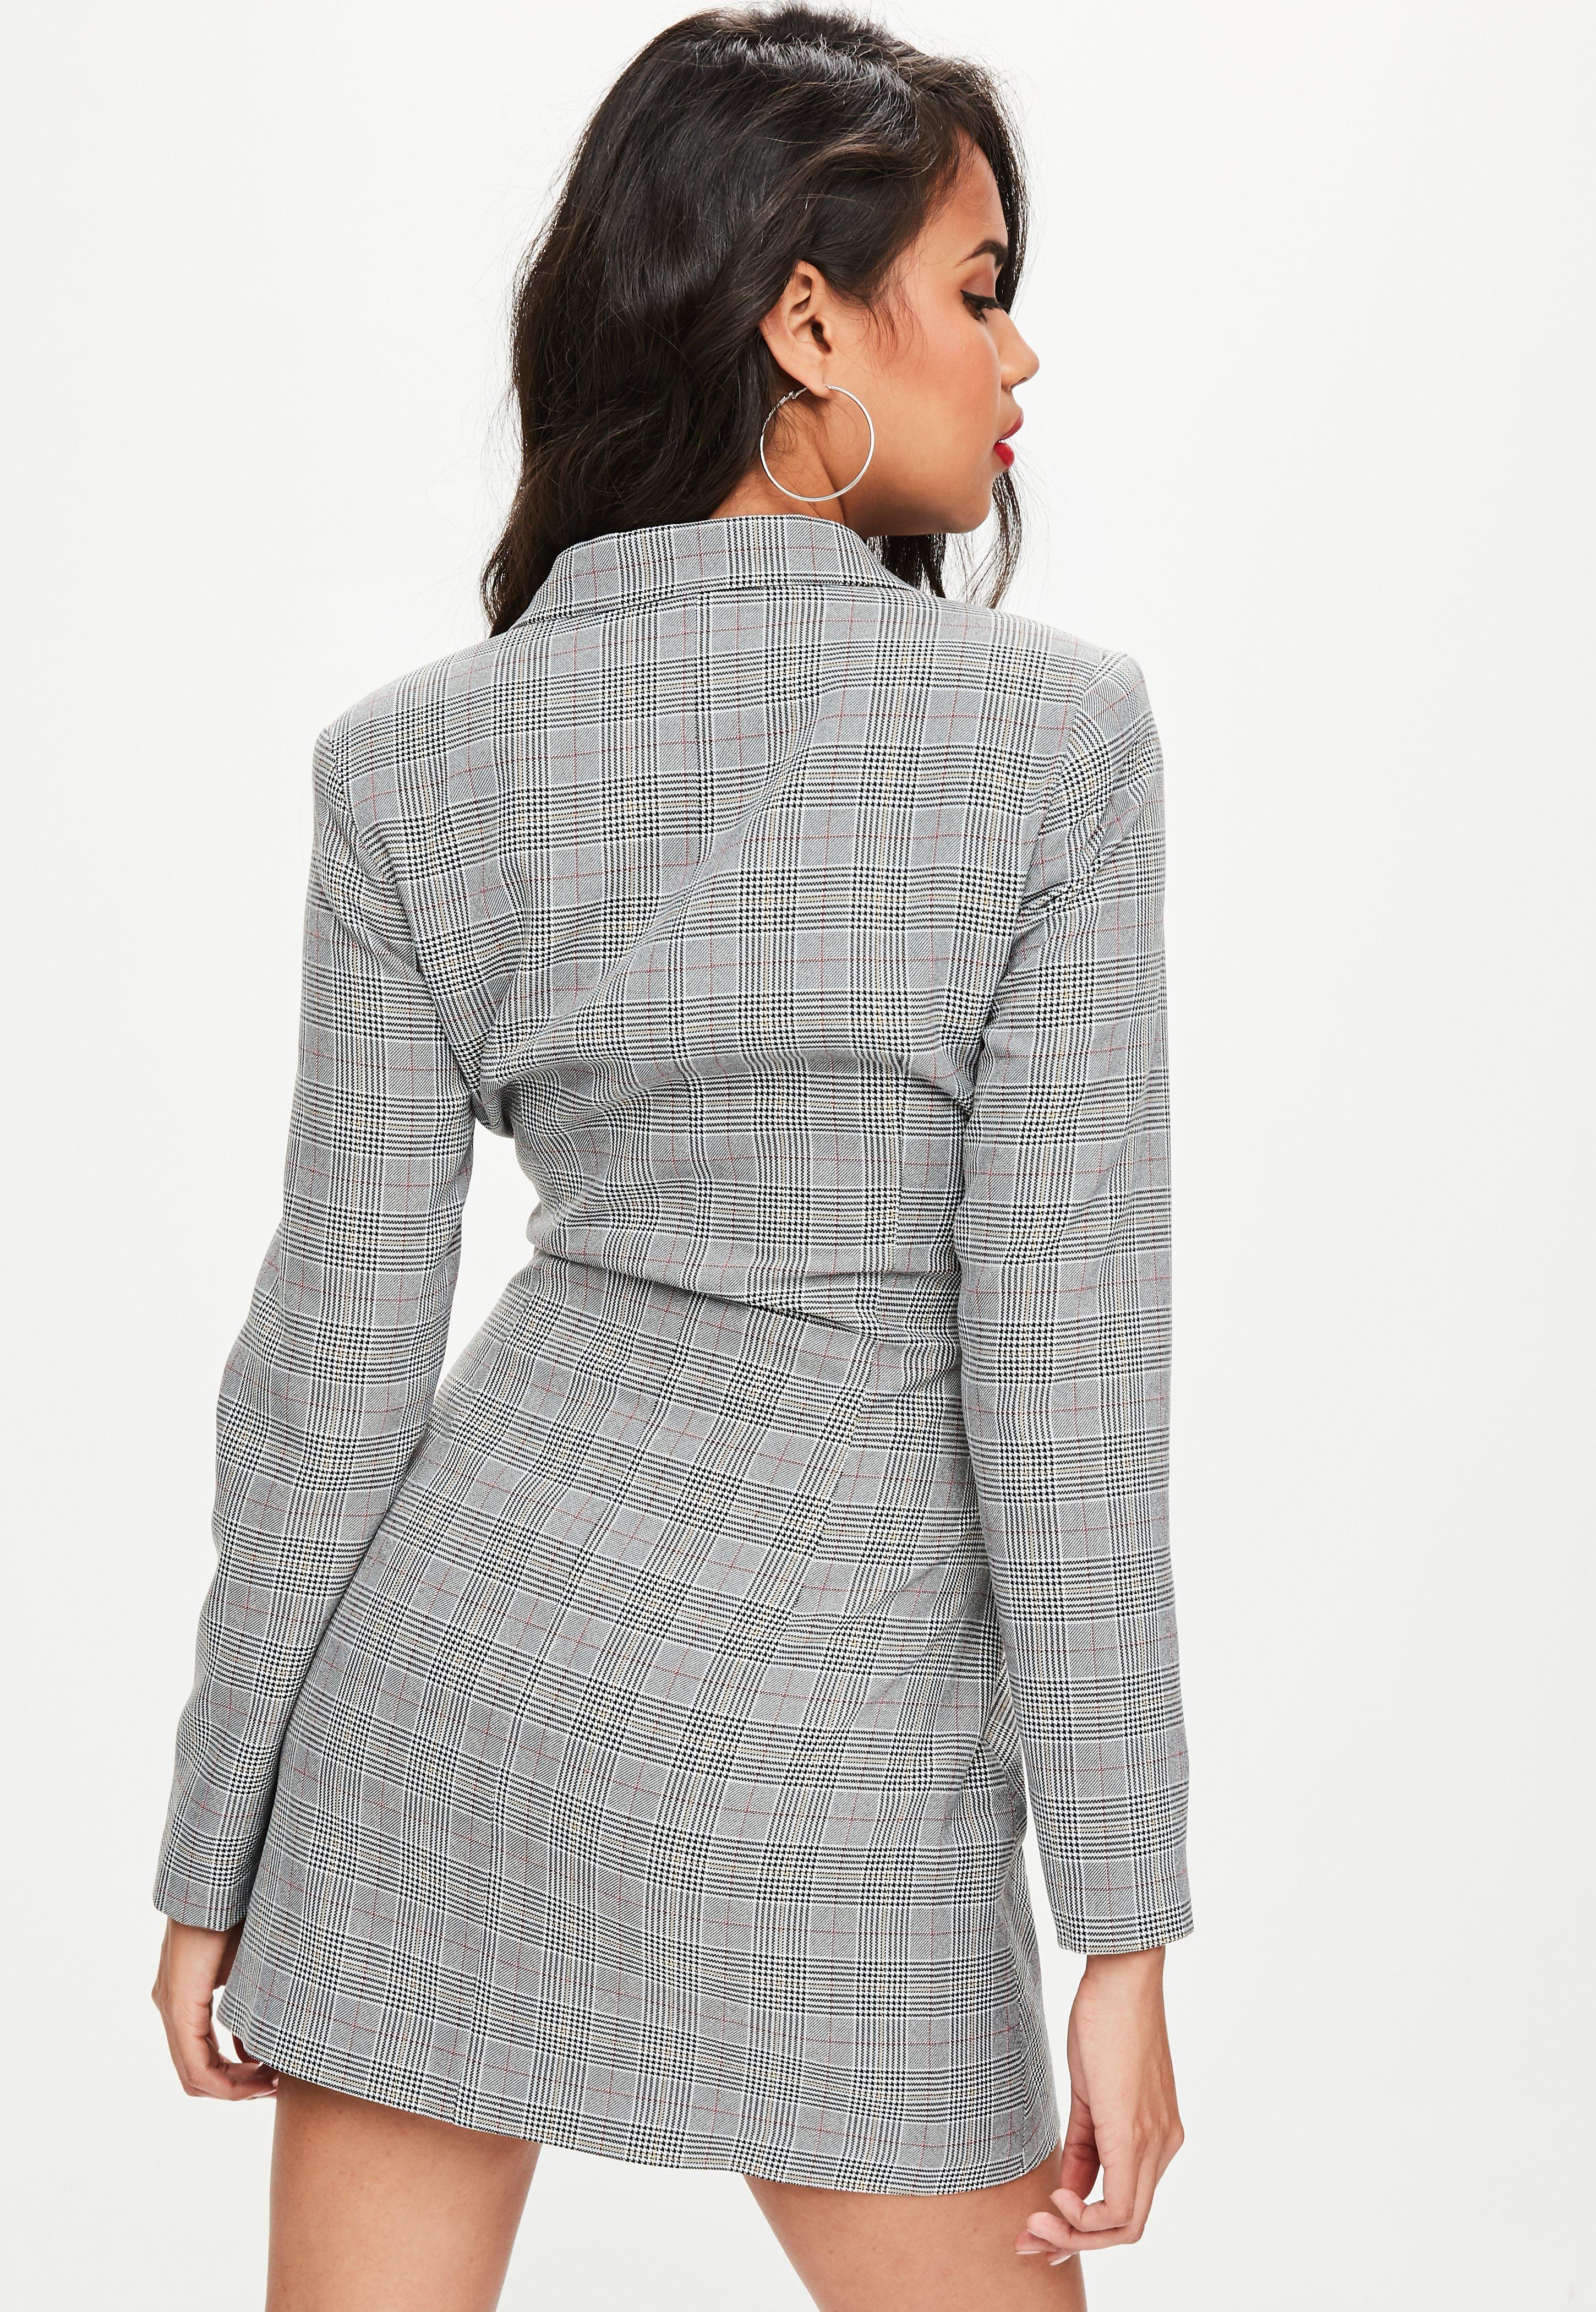 91313f4ddd Missguided Grey Check Belted Blazer Dress in Gray - Lyst